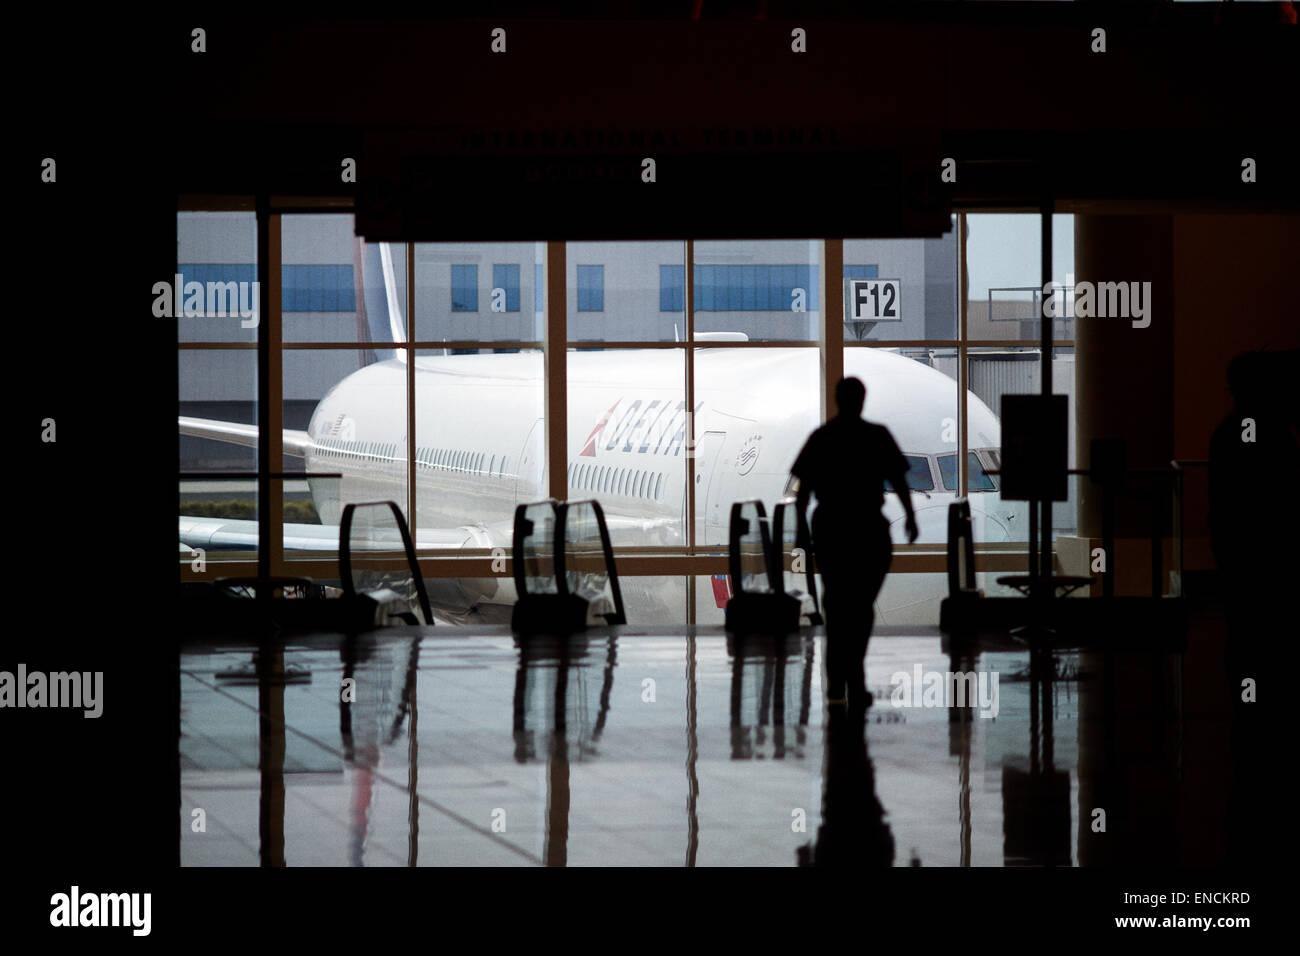 Atlanta in Georgia USA Hartsfield–Jackson Atlanta International Airport known locally as Atlanta Airport, Hartsfield, - Stock Image